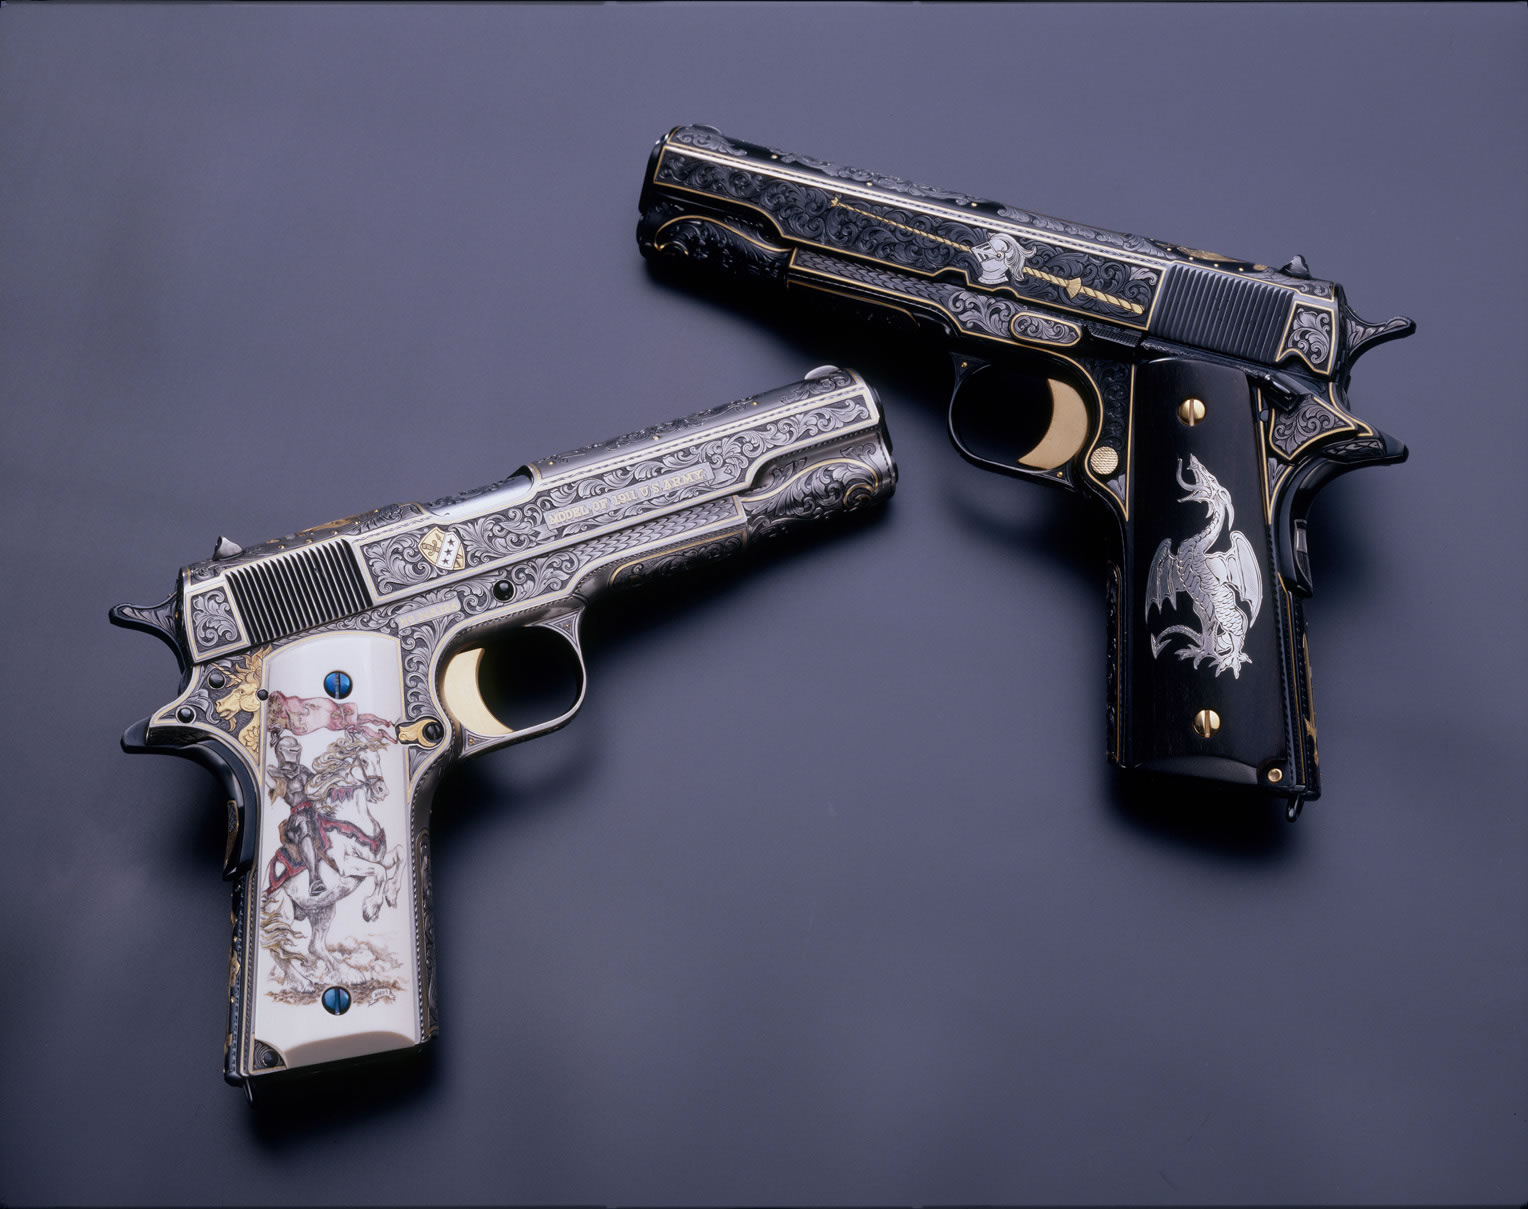 Download Guns Weapons Wallpaper 1528x1209 Wallpoper 248454 1528x1209